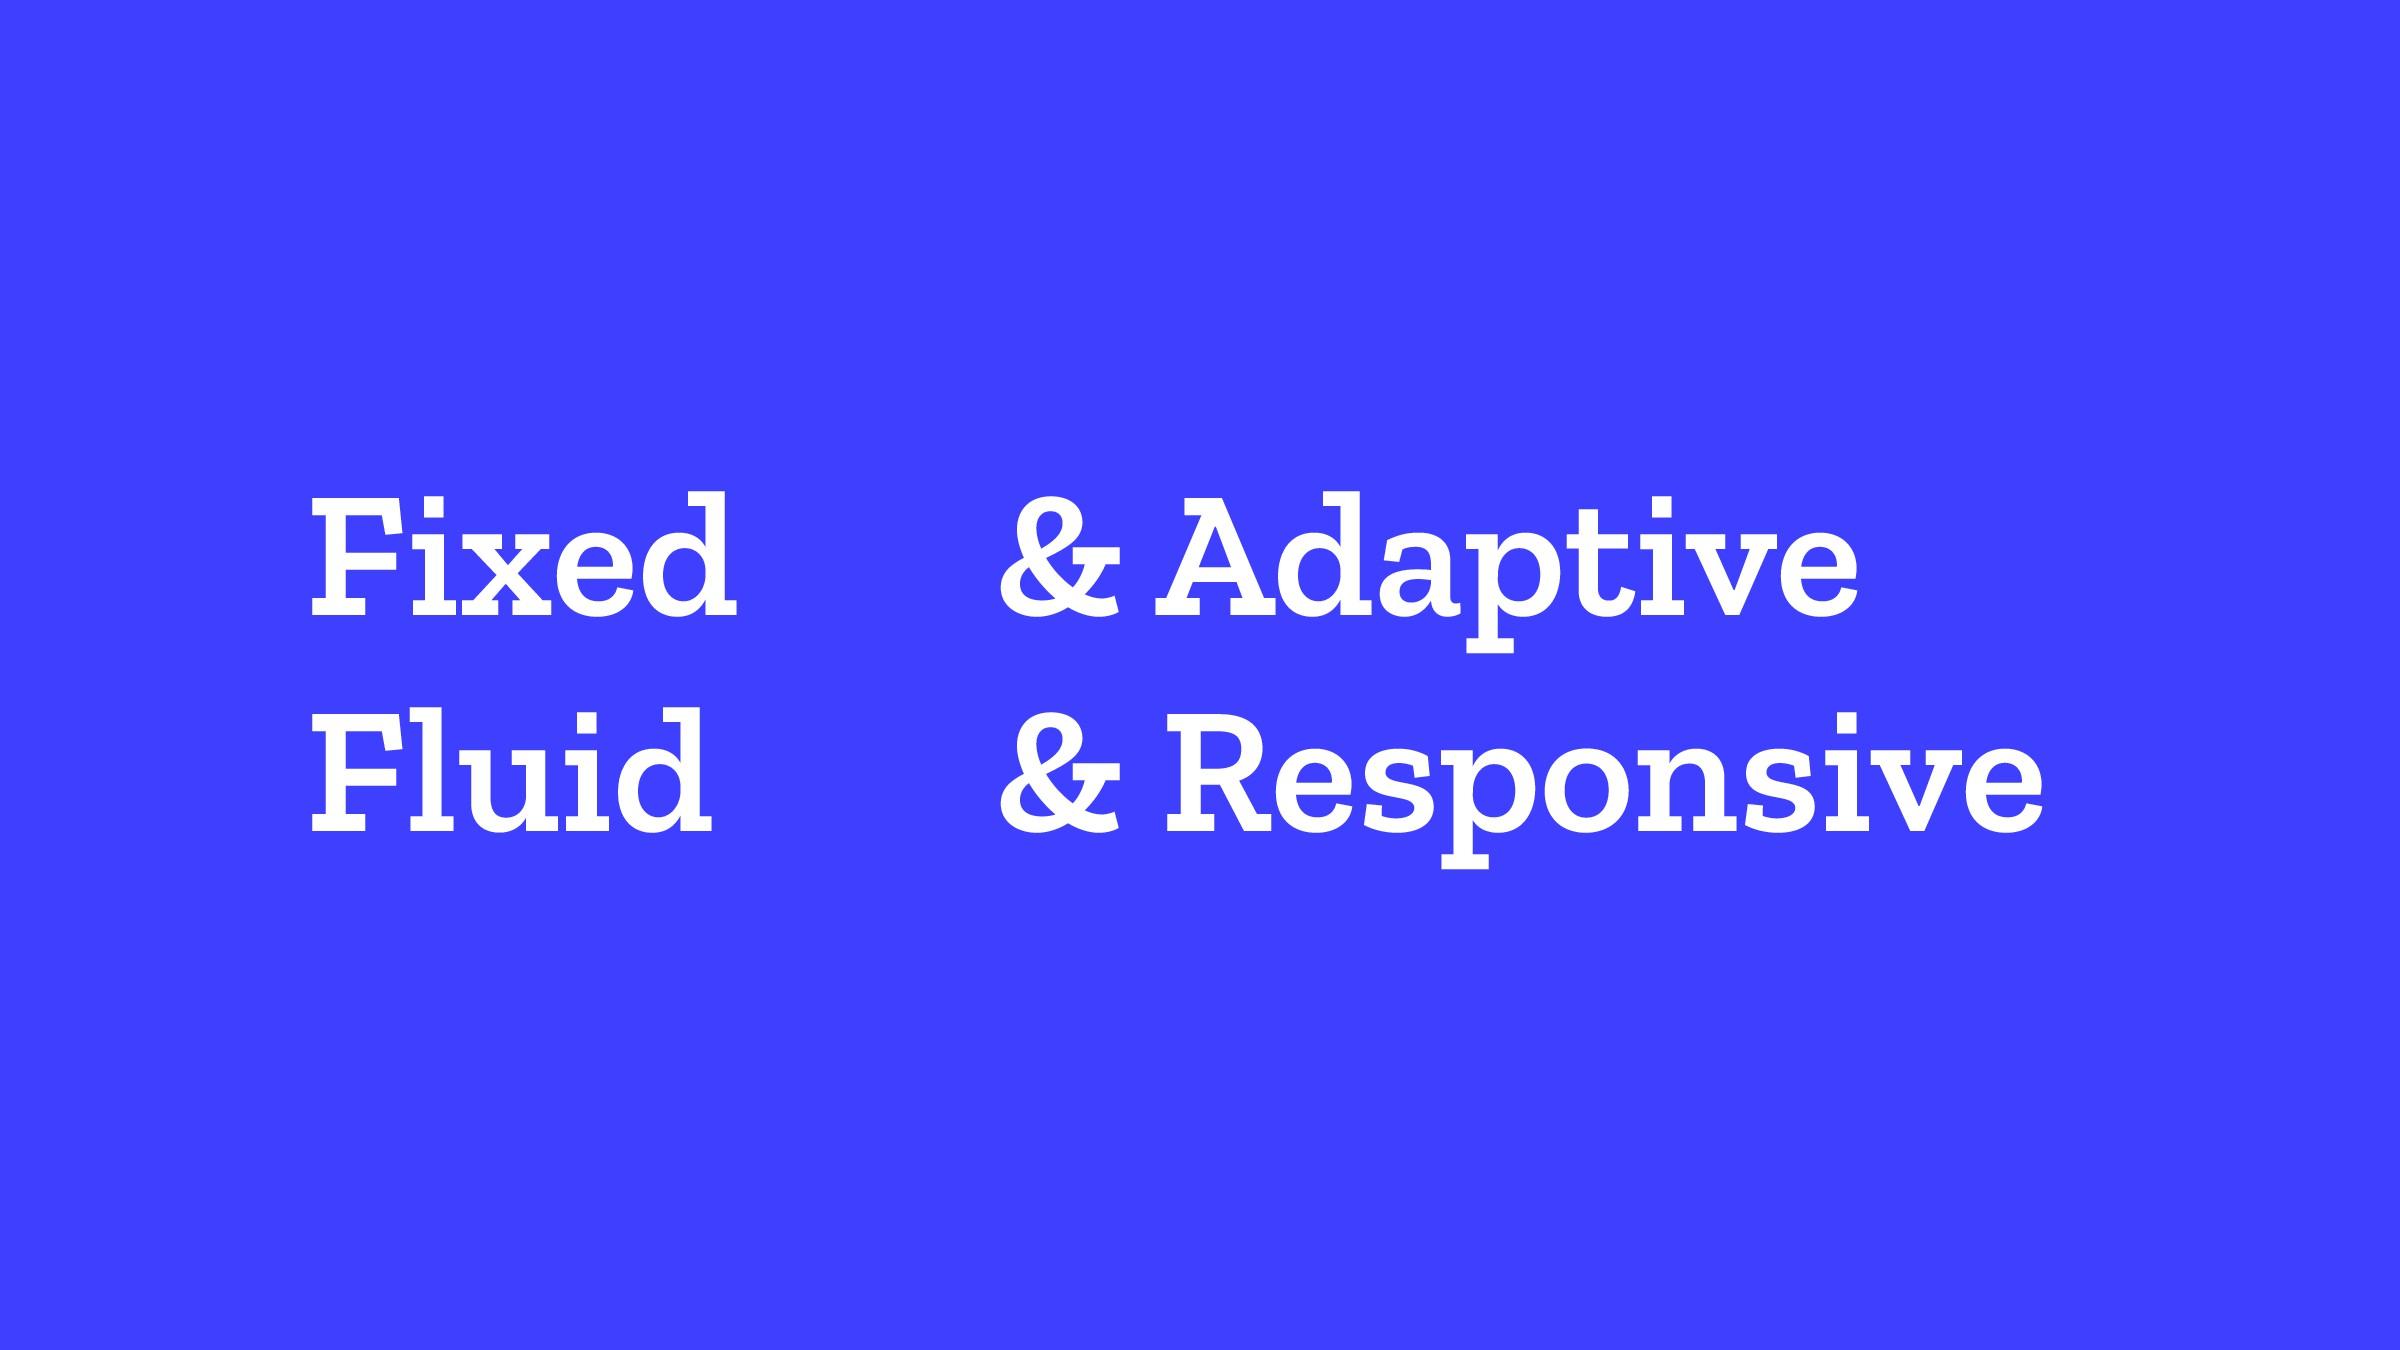 Fixed Fluid & Adaptive & Responsive